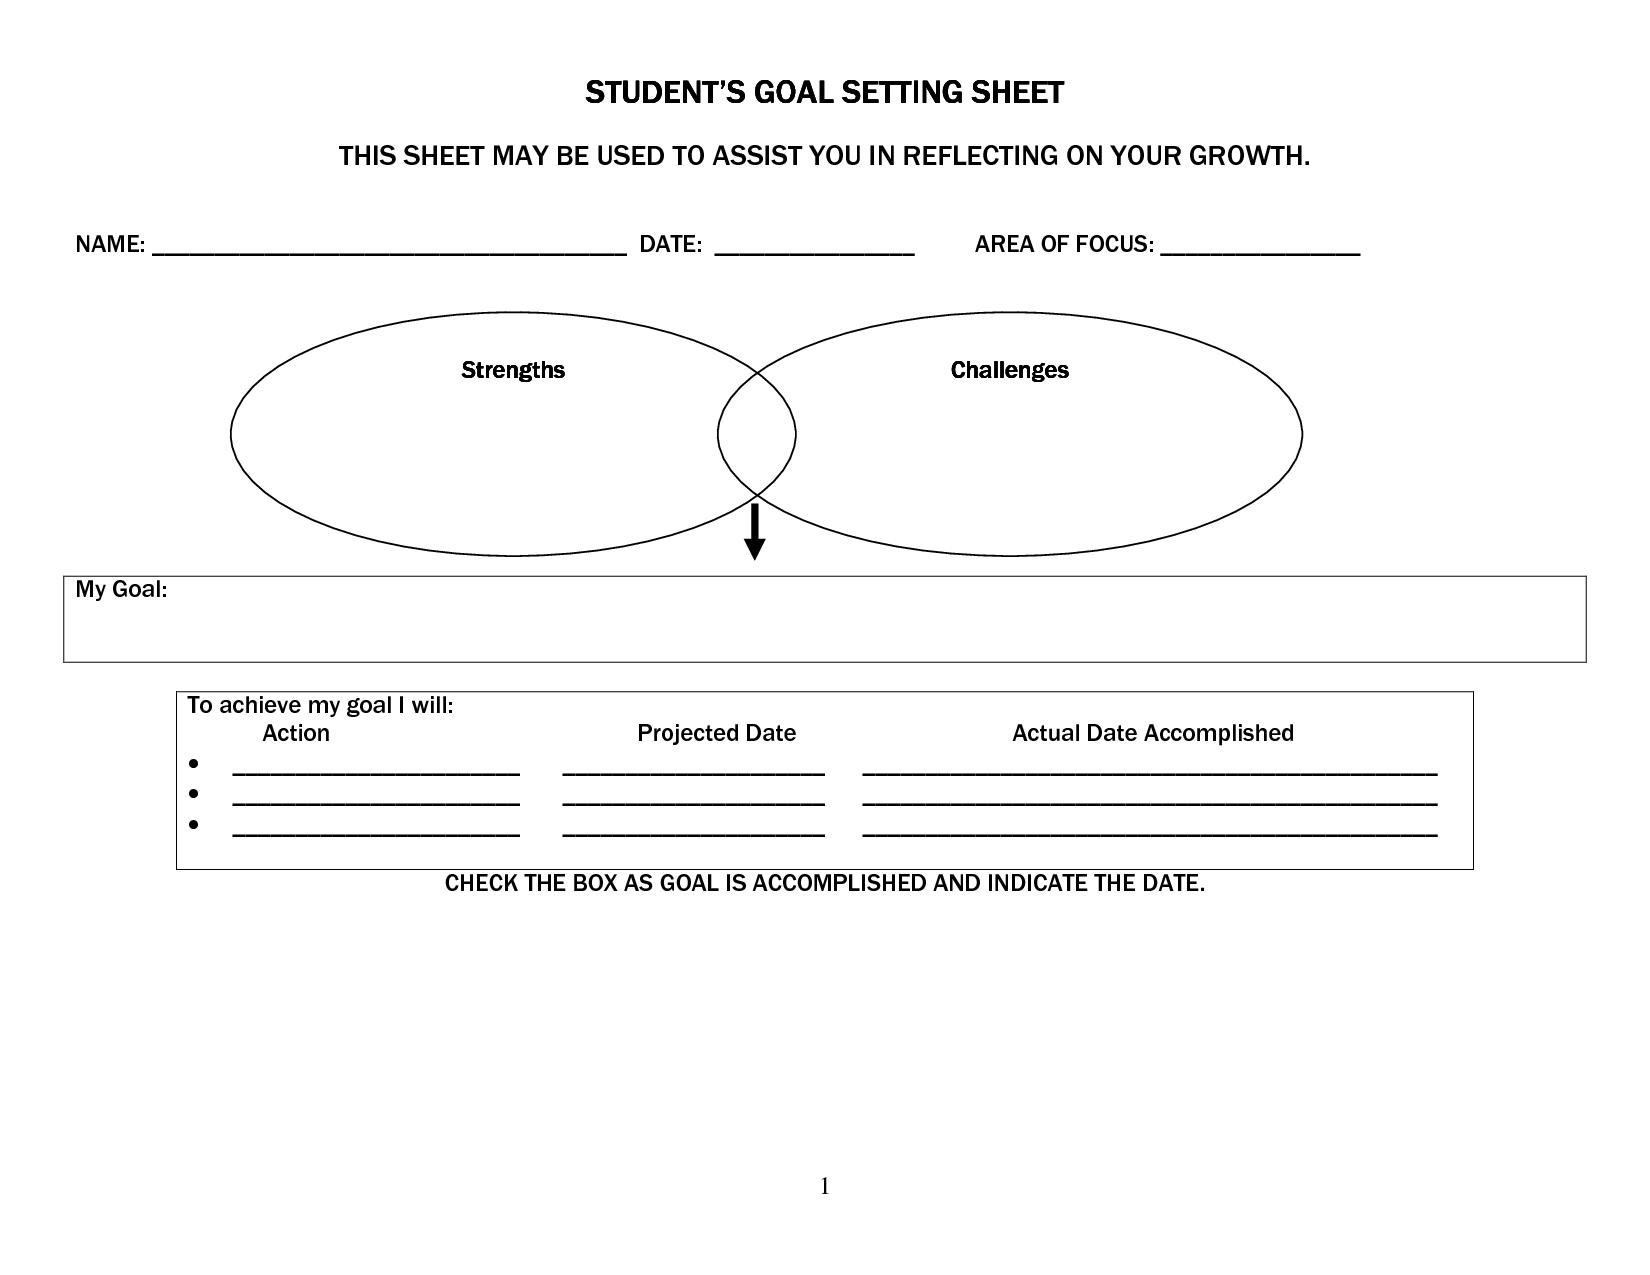 Goal Setting Sheets For High School Students Student Success Student Goals Goal Setting For Students [ 1275 x 1650 Pixel ]